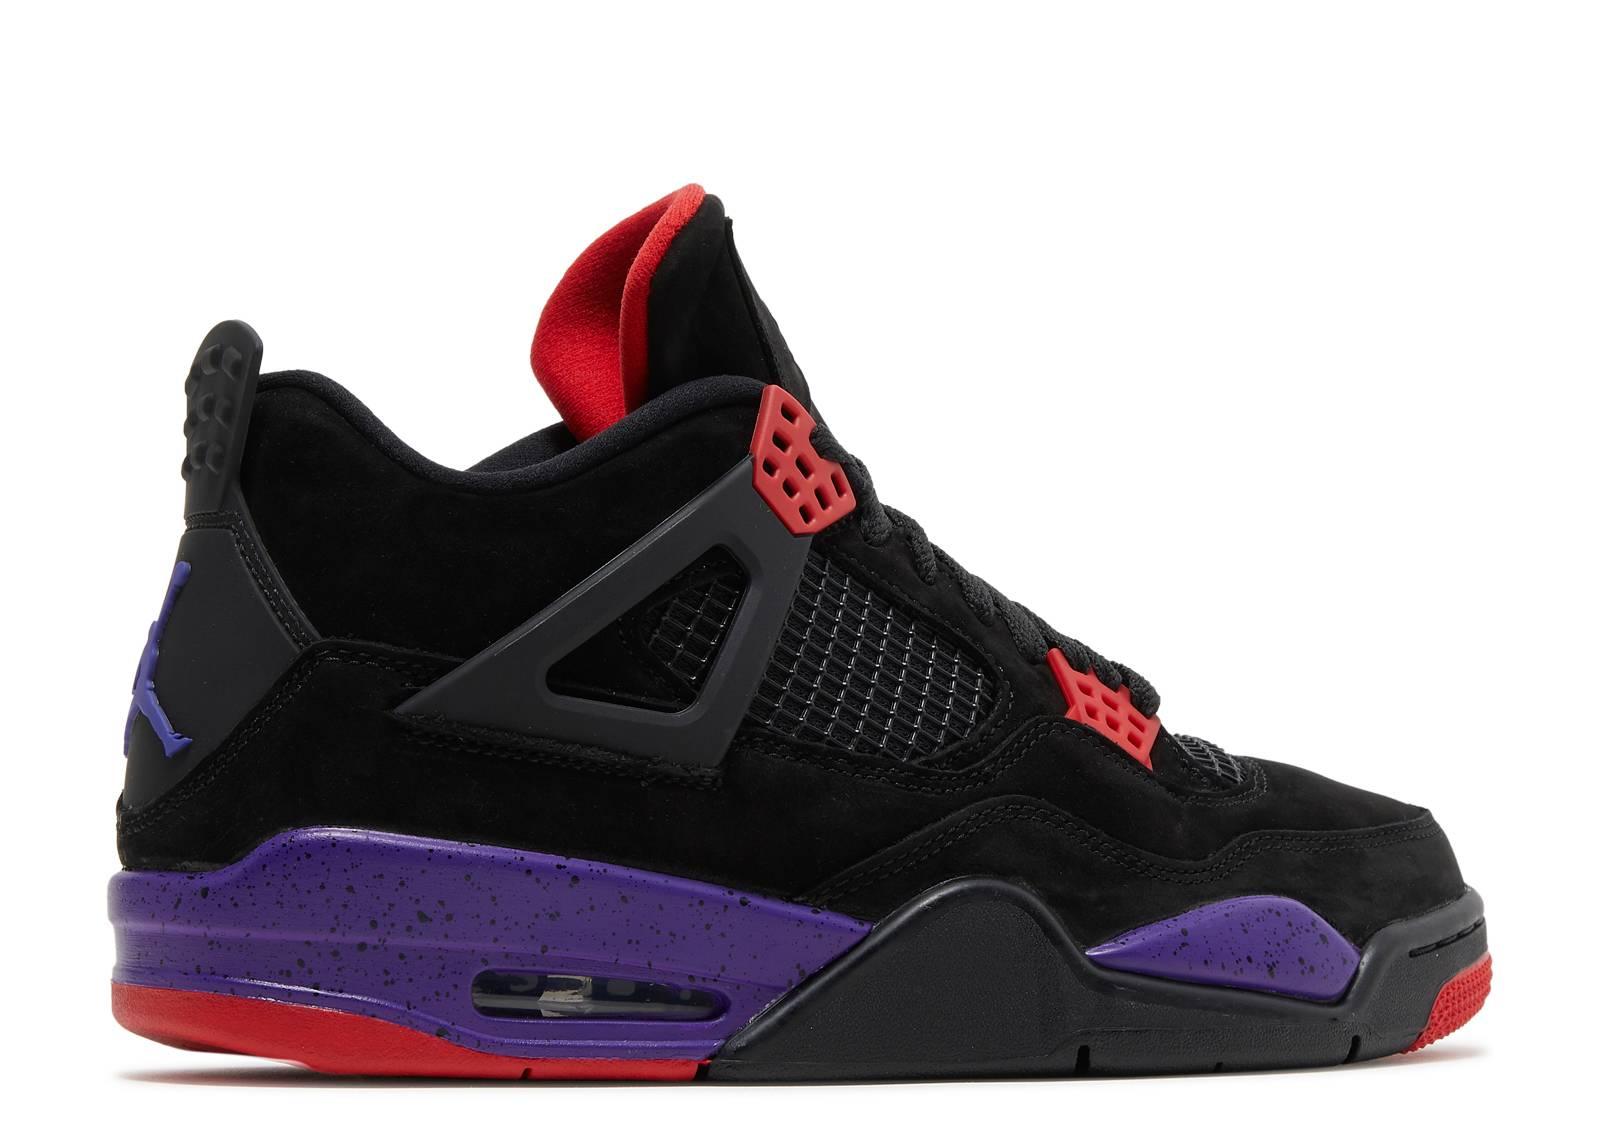 Air Jordan 4 Retro Nrg